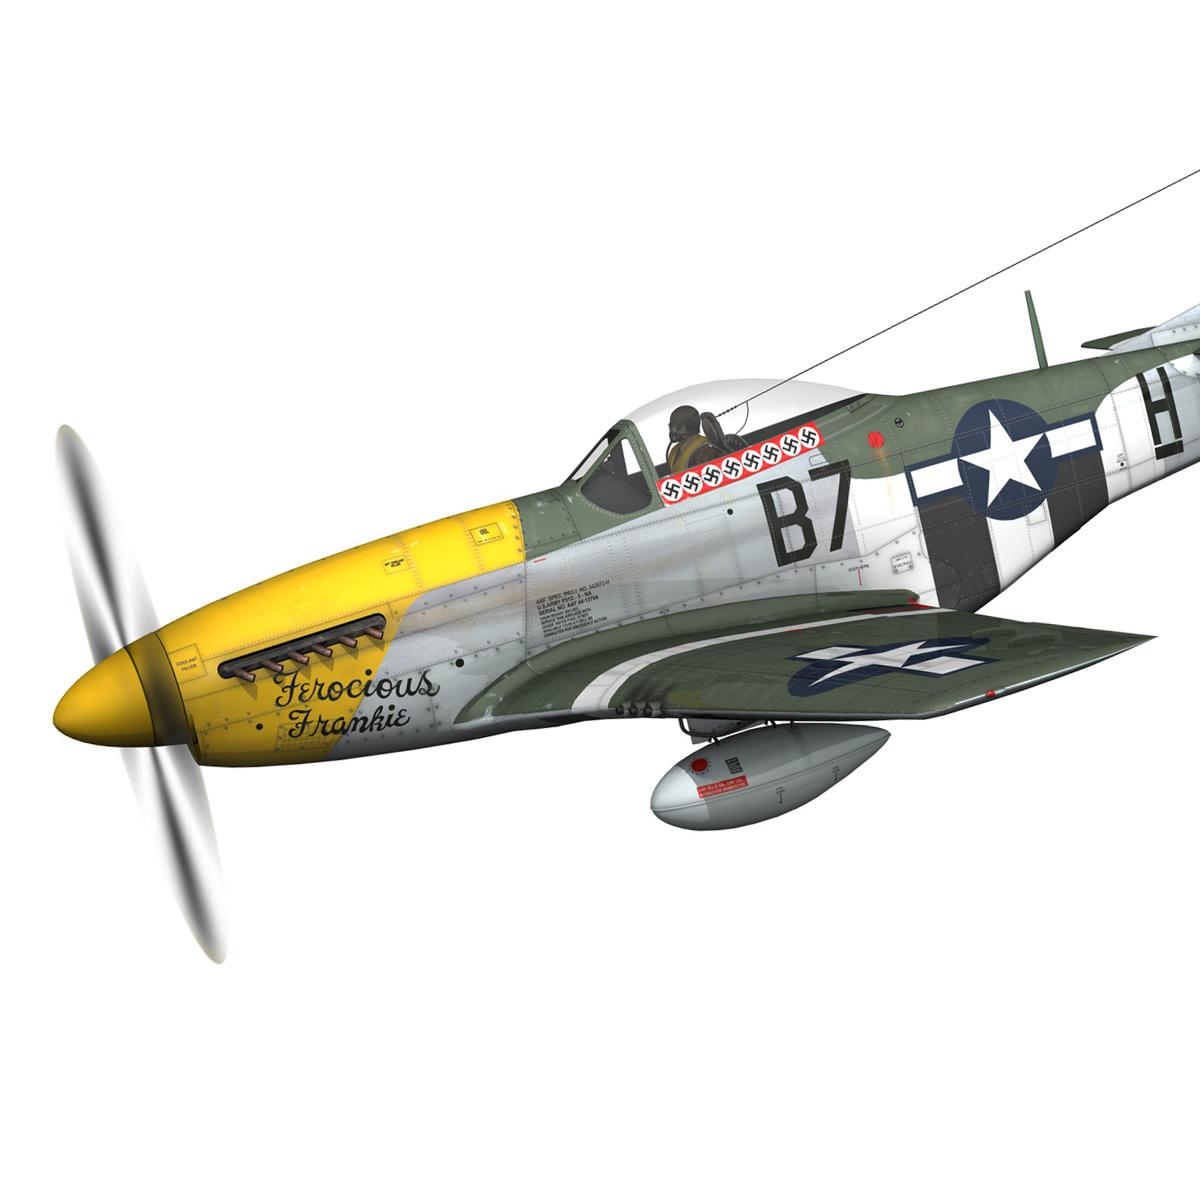 north american p-51d mustang – ferocious frankie 3d model fbx c4d lwo obj 269486